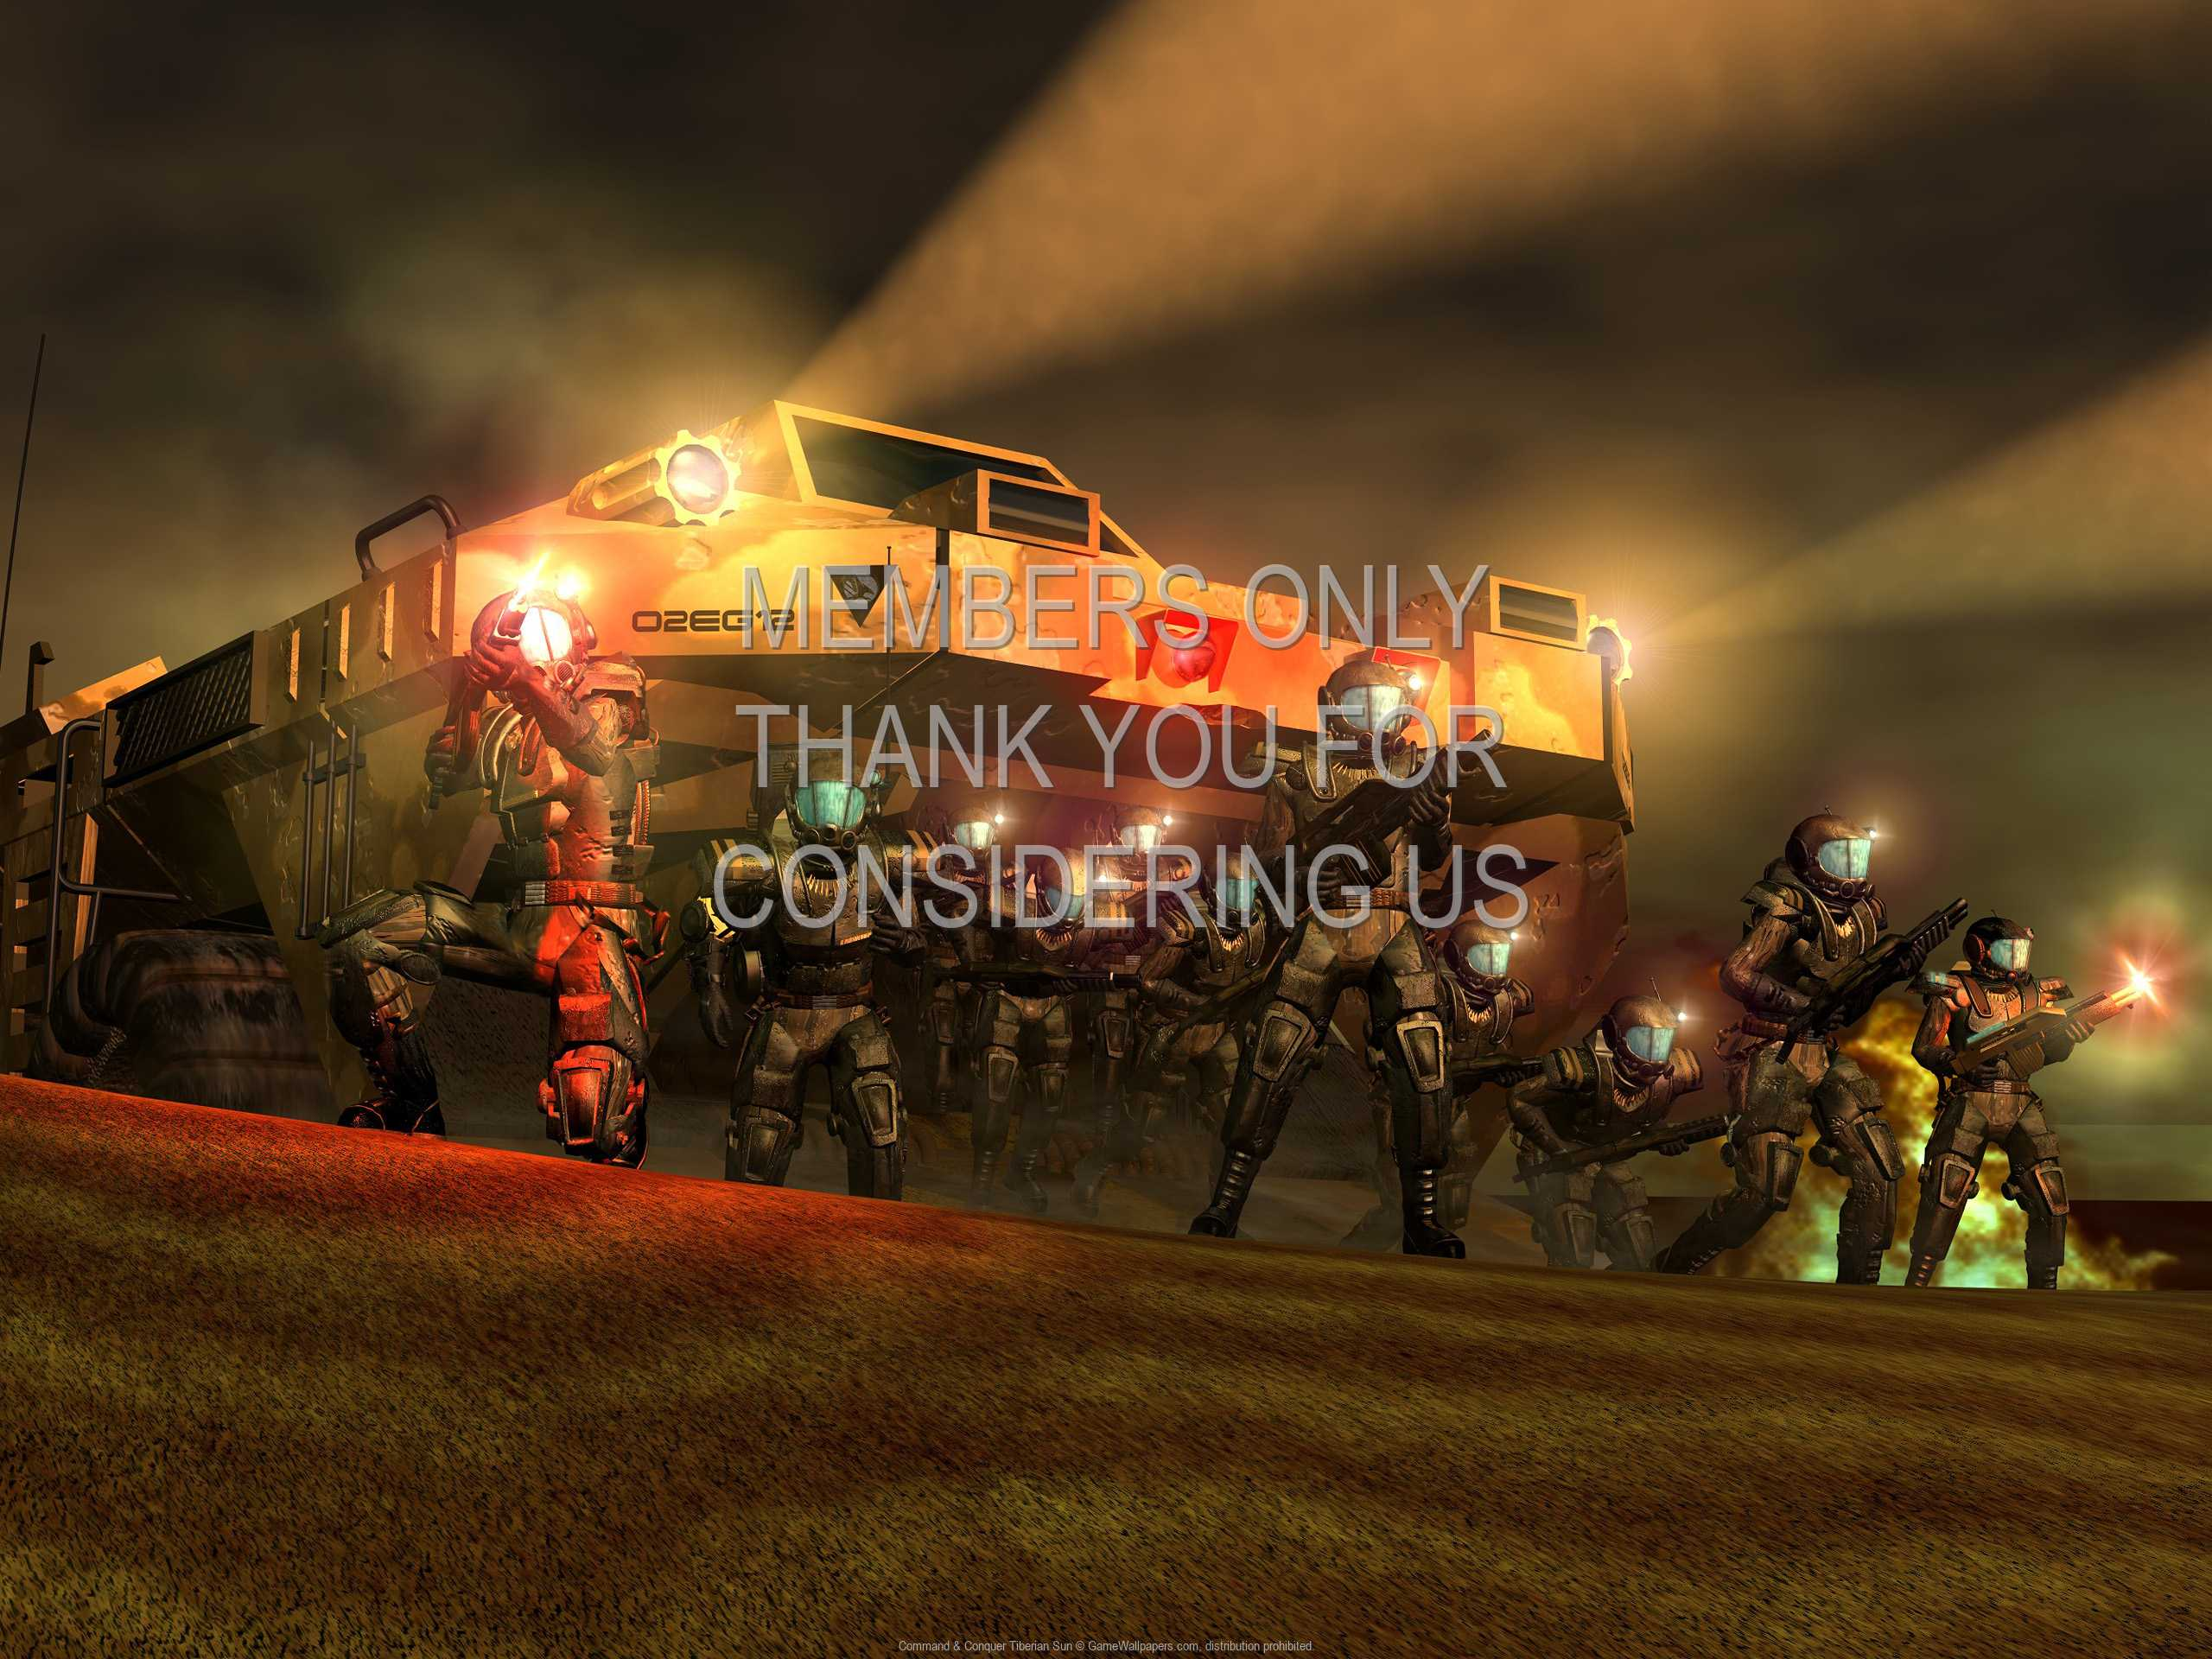 Command & Conquer: Tiberian Sun 1080p Horizontal Handy Hintergrundbild 02